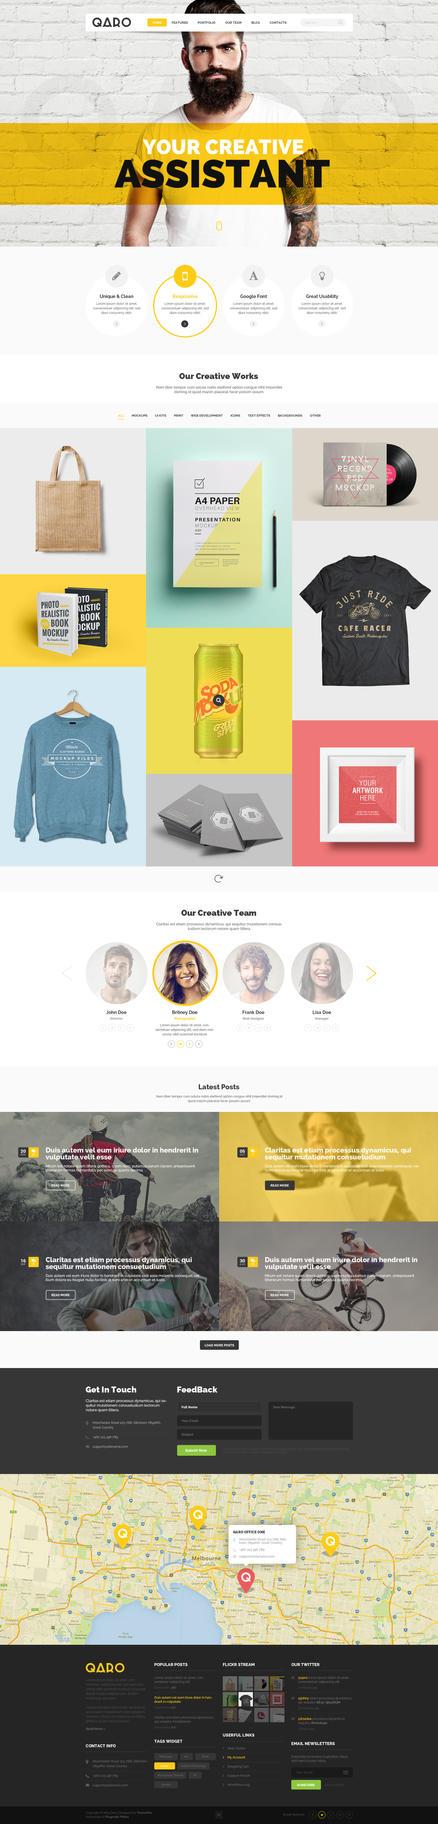 QARO - Clean Creative WordPress Template by webdesigngeek